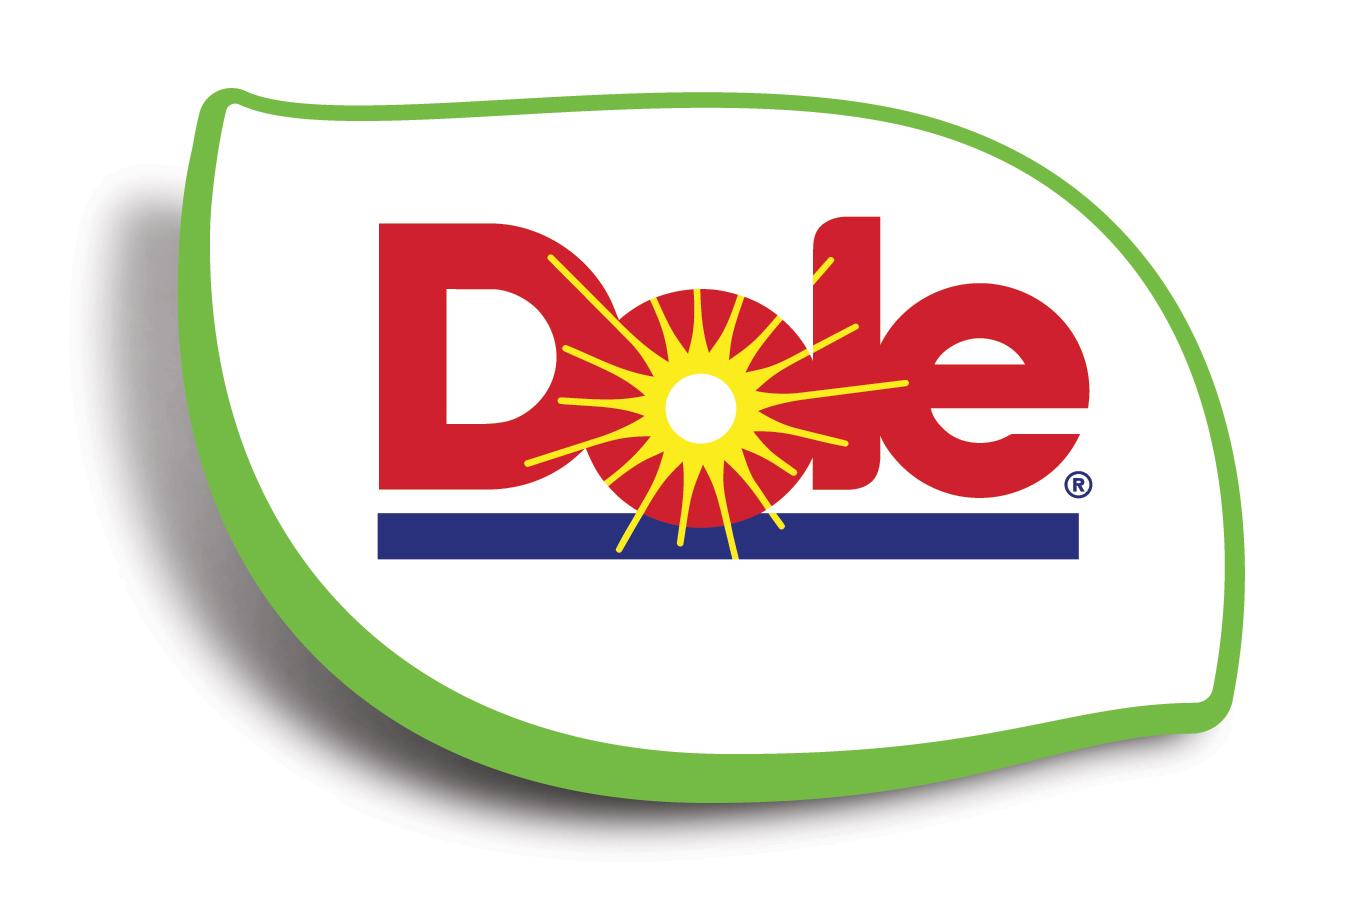 dole food company mission statement